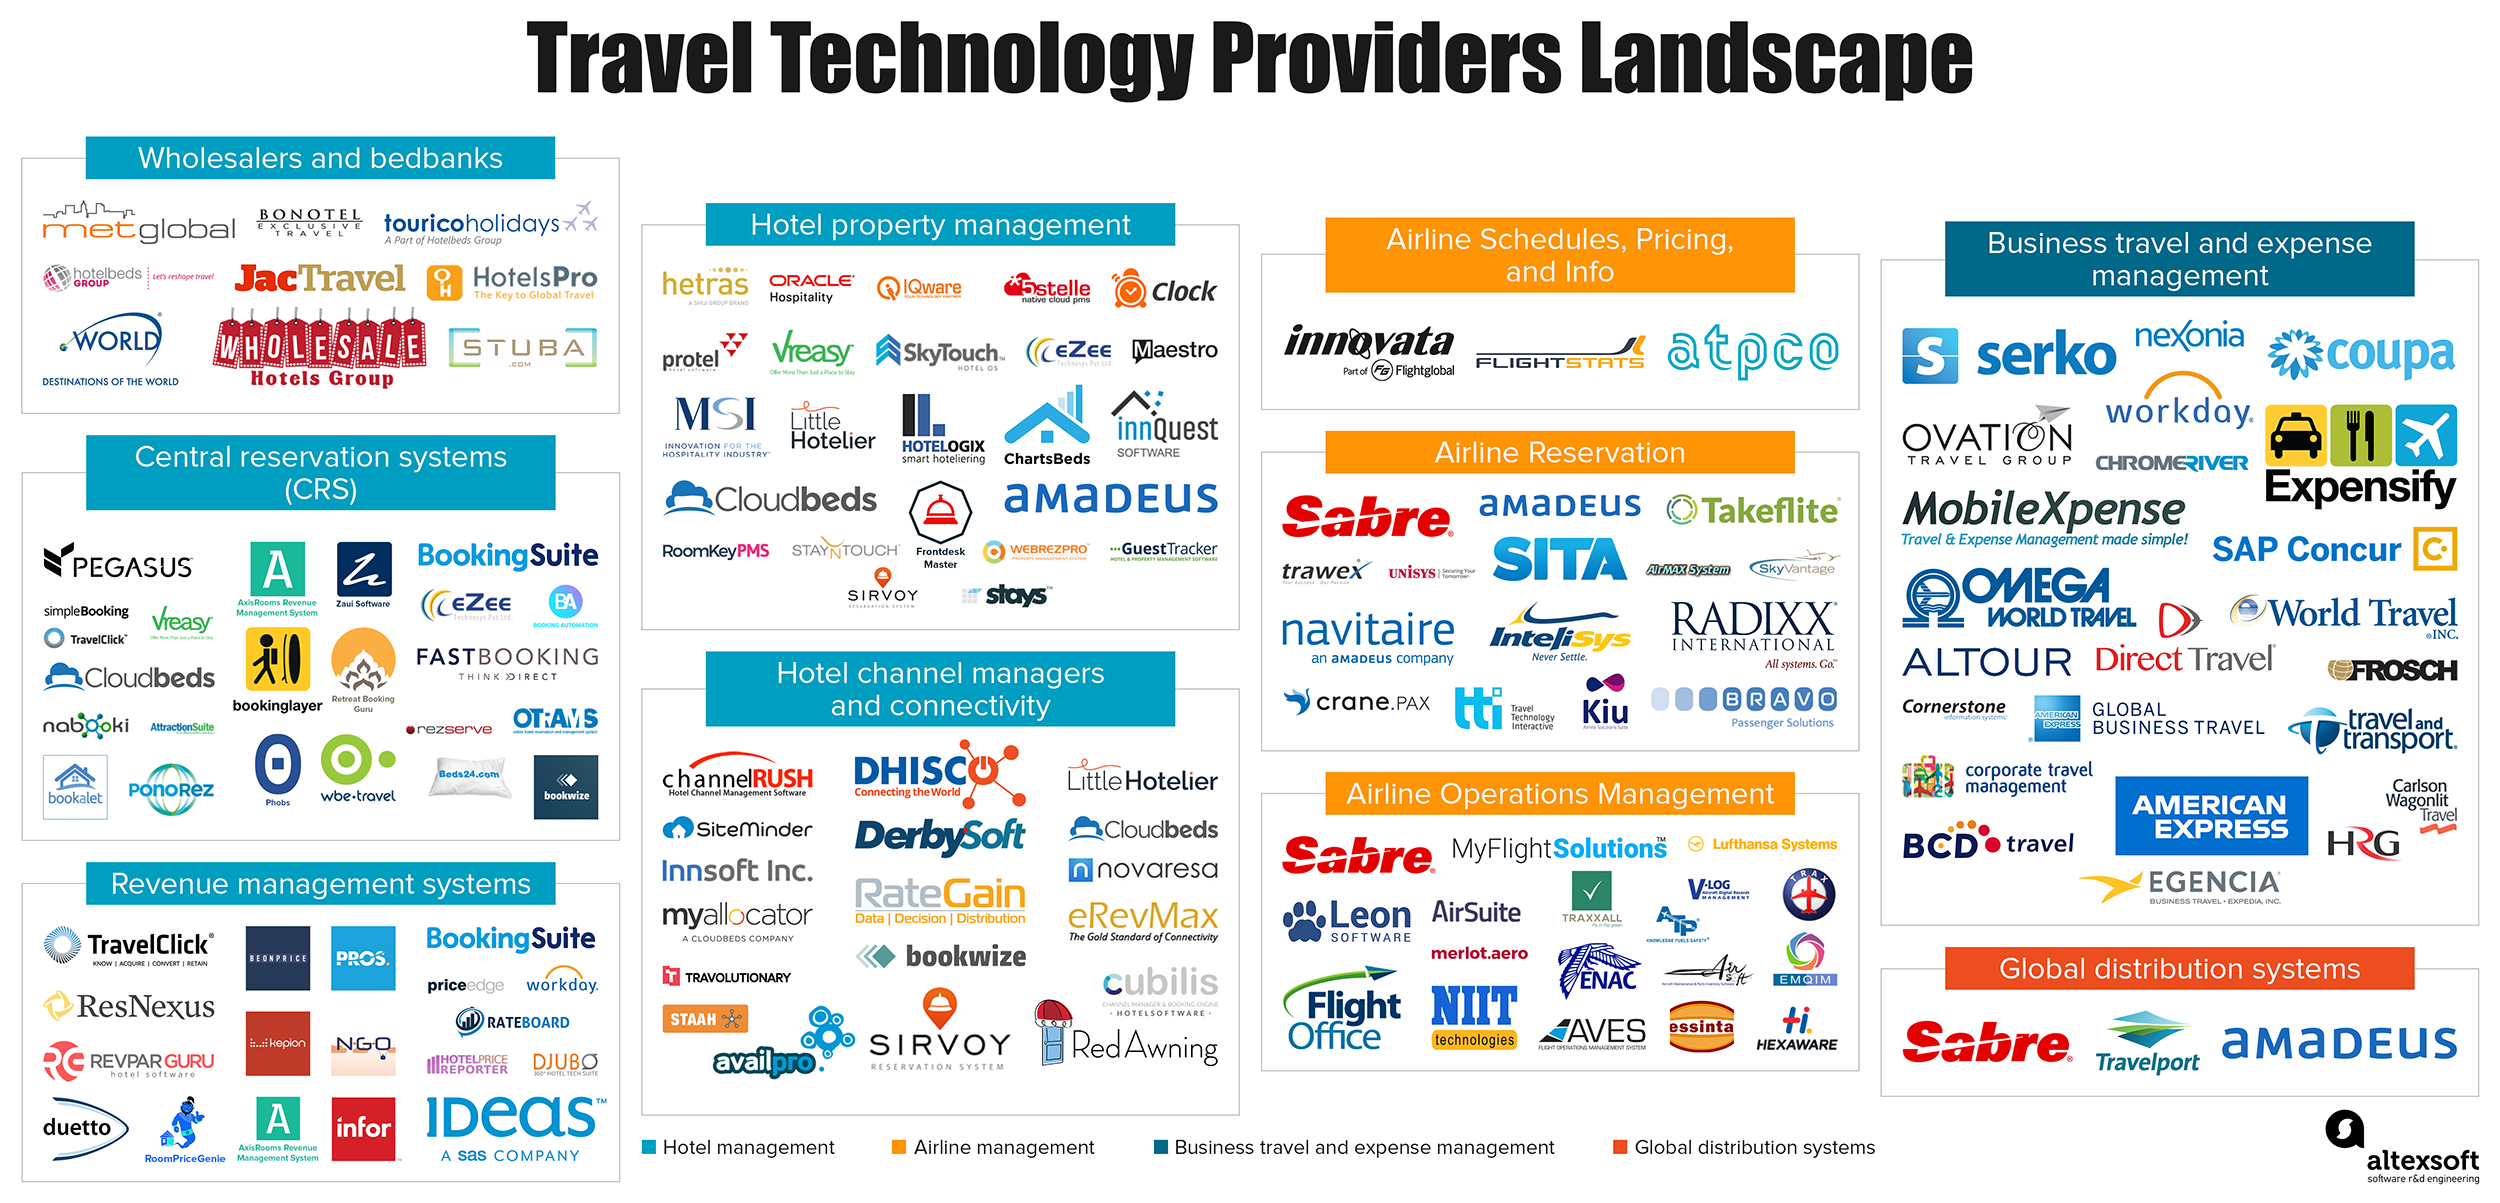 Travel Technology Providers Landscape [Infographic] | AltexSoft